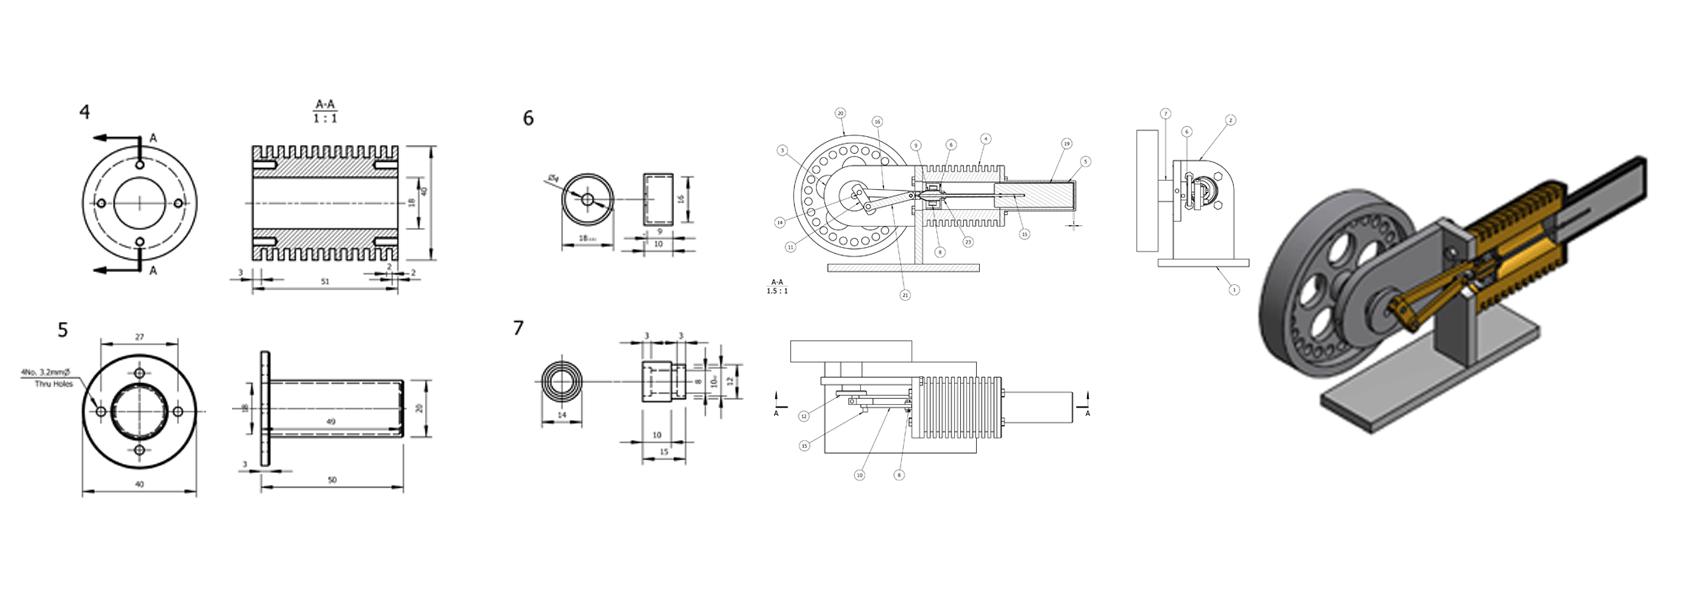 picture black and white CAD design services autocad revit inventor